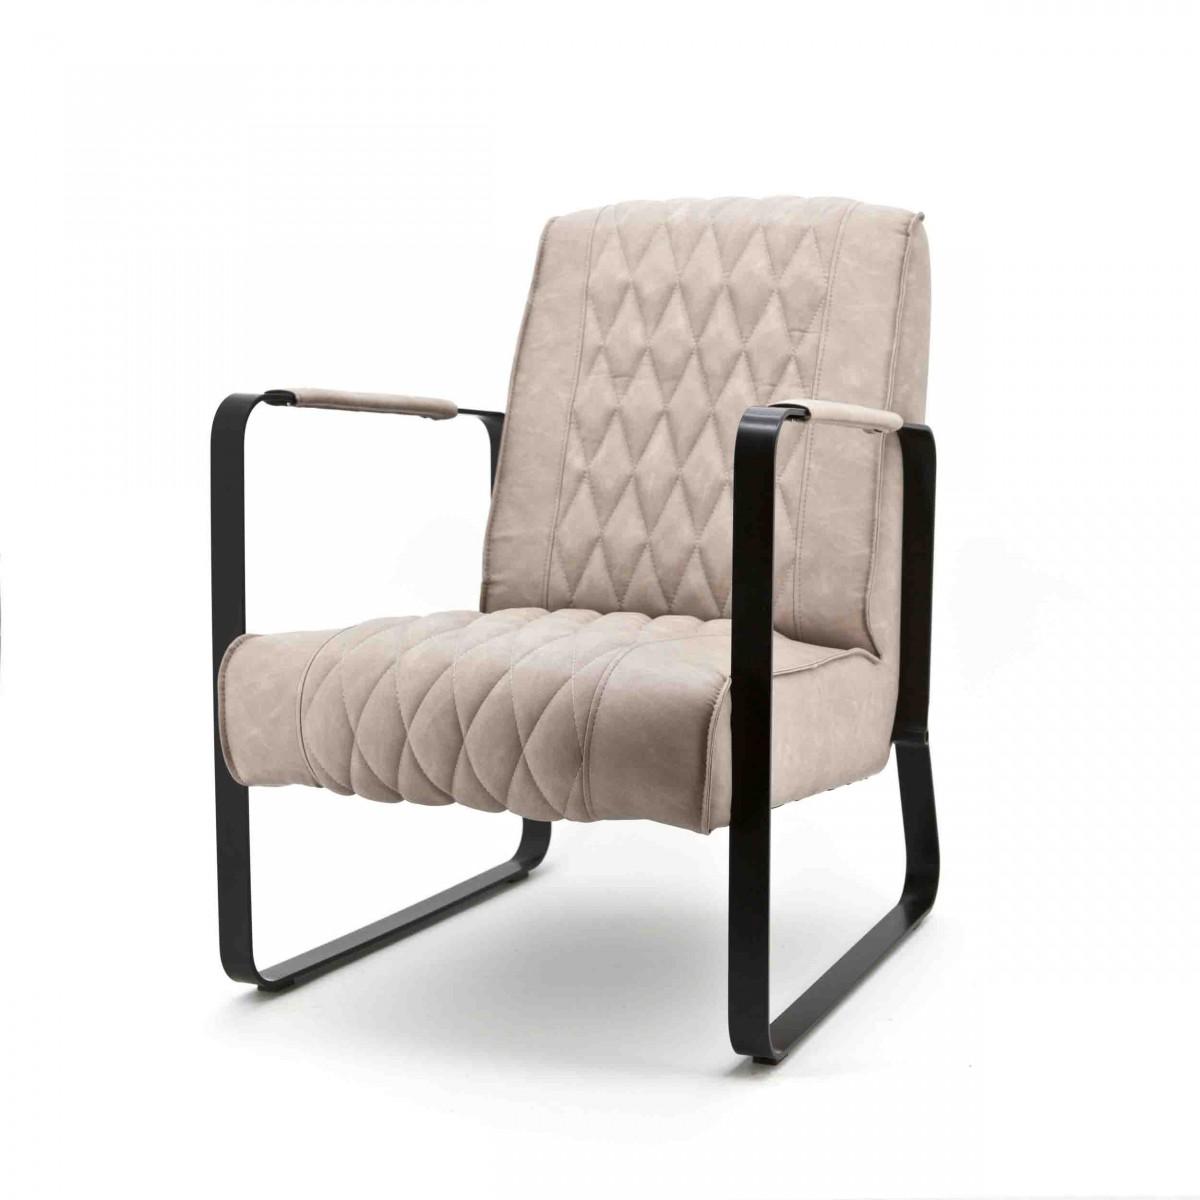 Caro-fauteuil-eleonora-vintage-retro-kunstleer